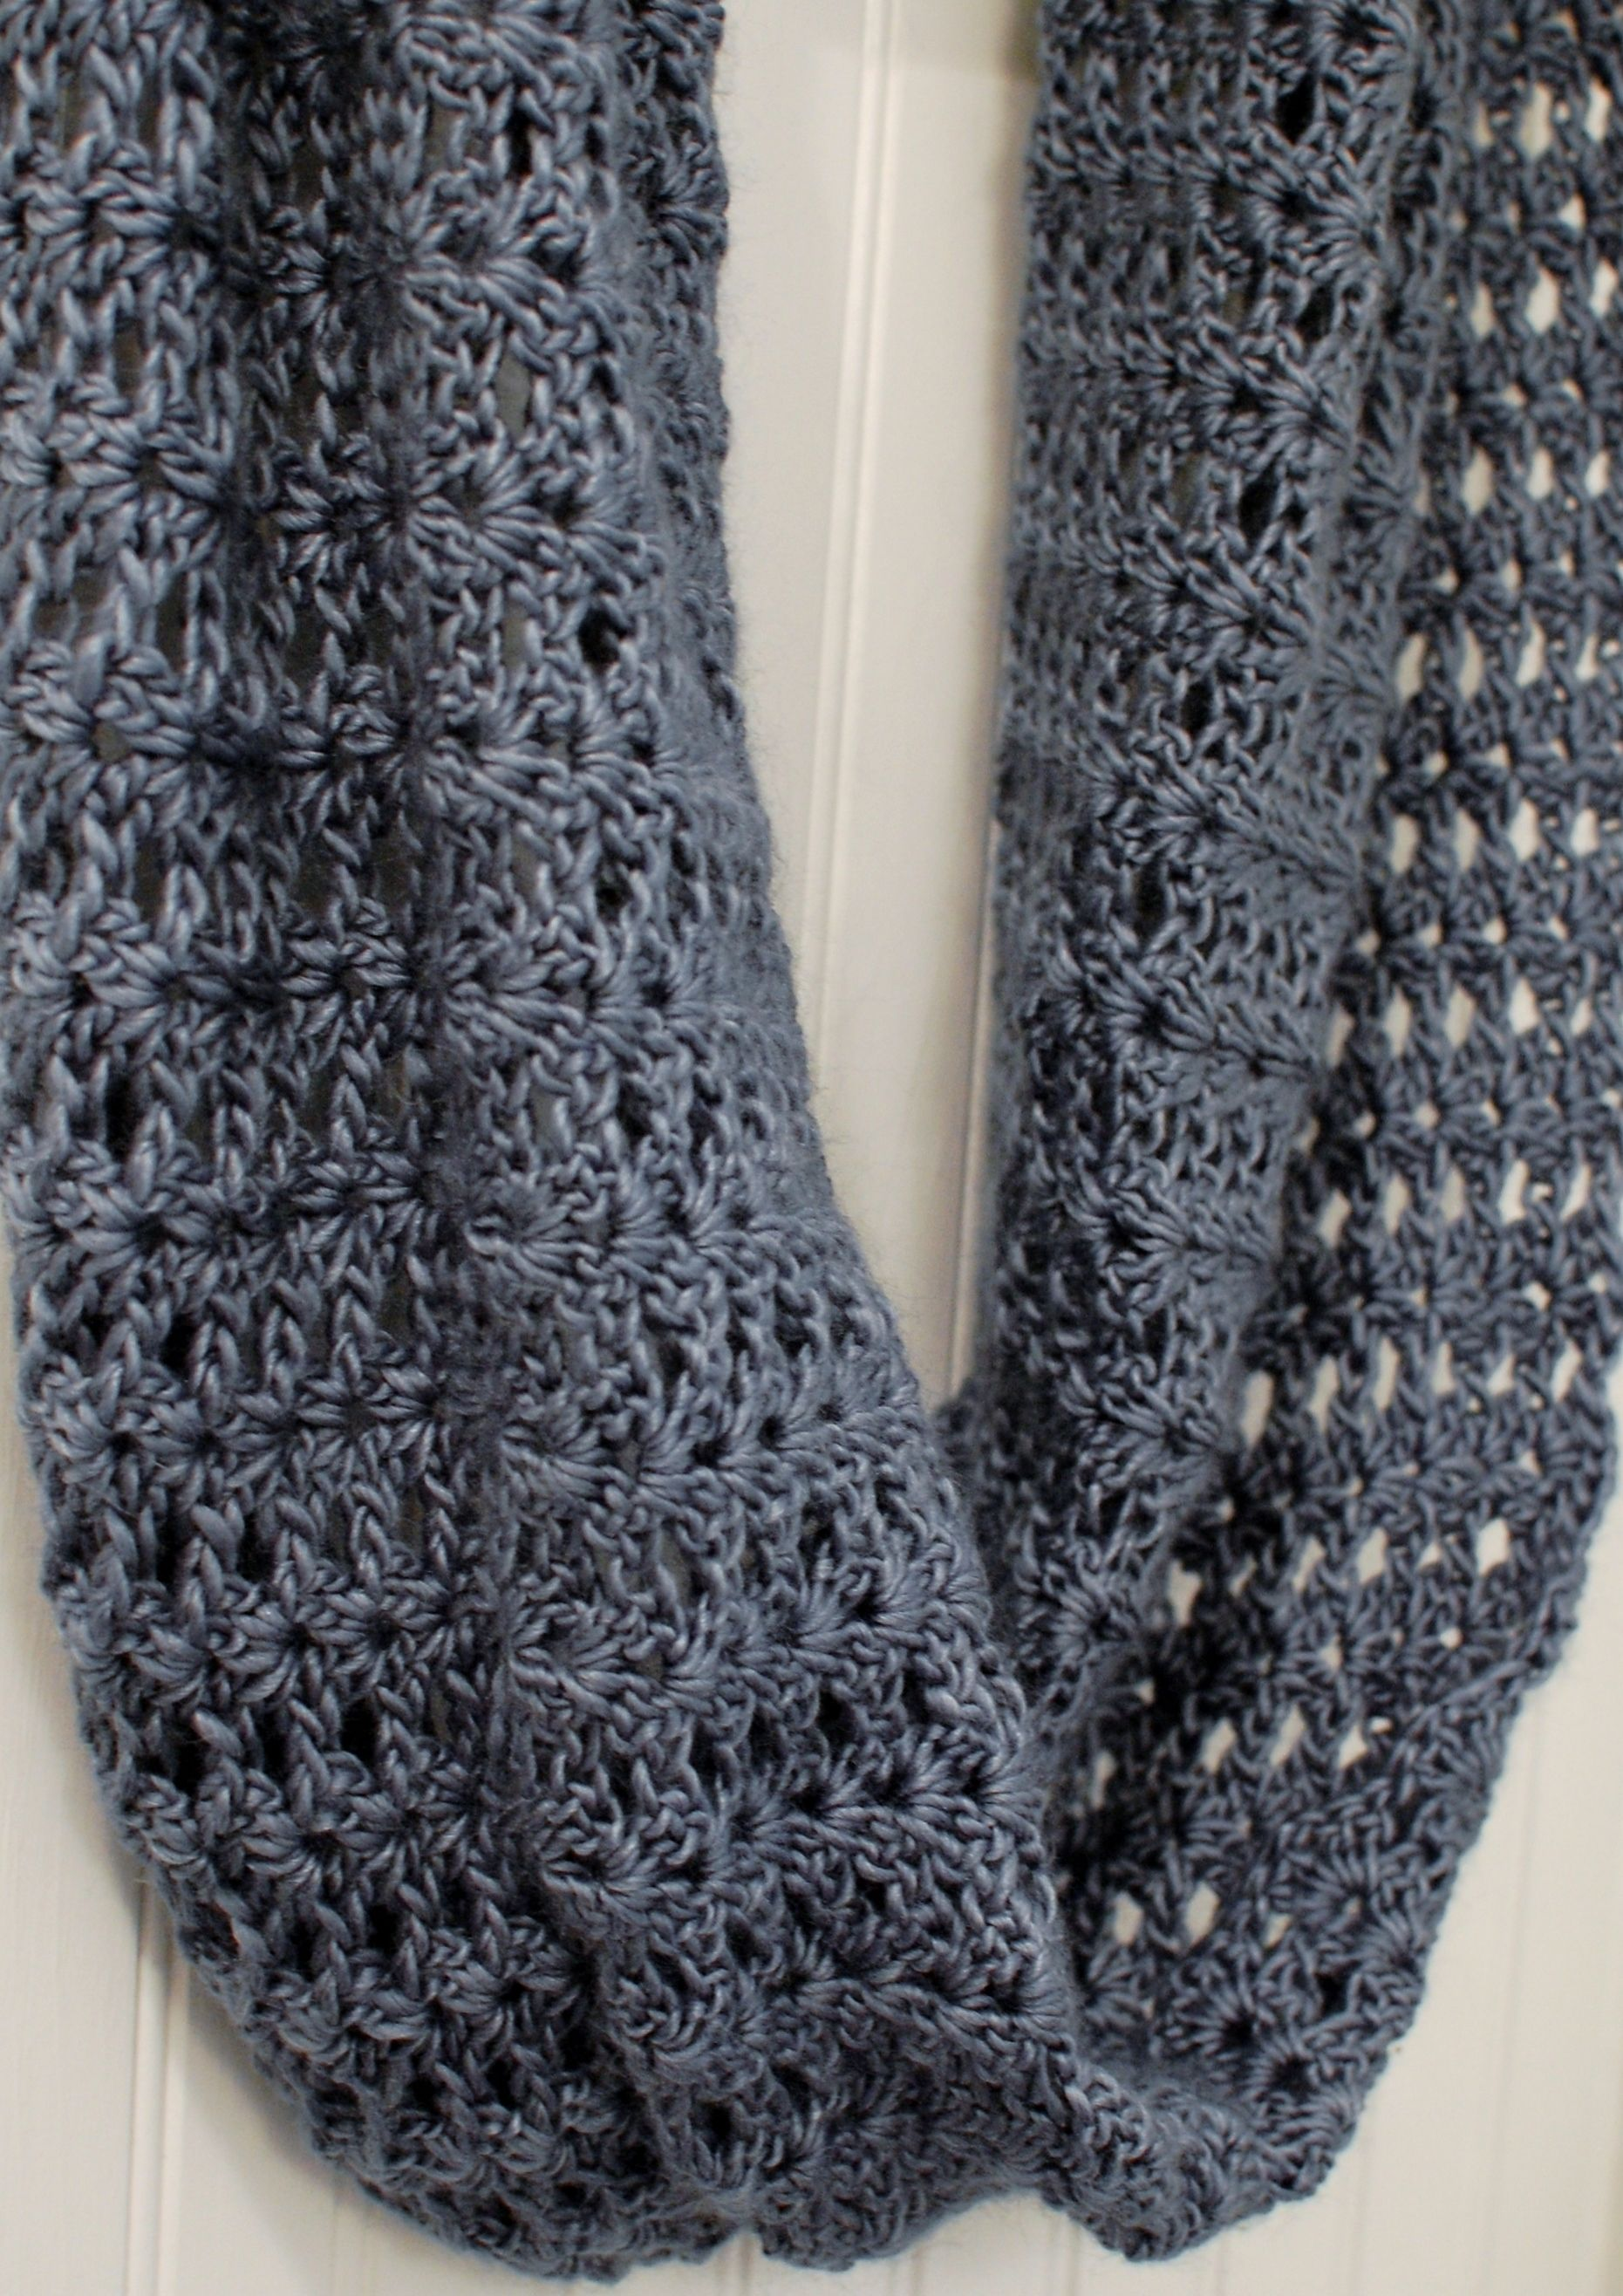 Free online scarves to crochet crochet pattern mobius infinity free online scarves to crochet crochet pattern mobius infinity scarf wrap includes bankloansurffo Images